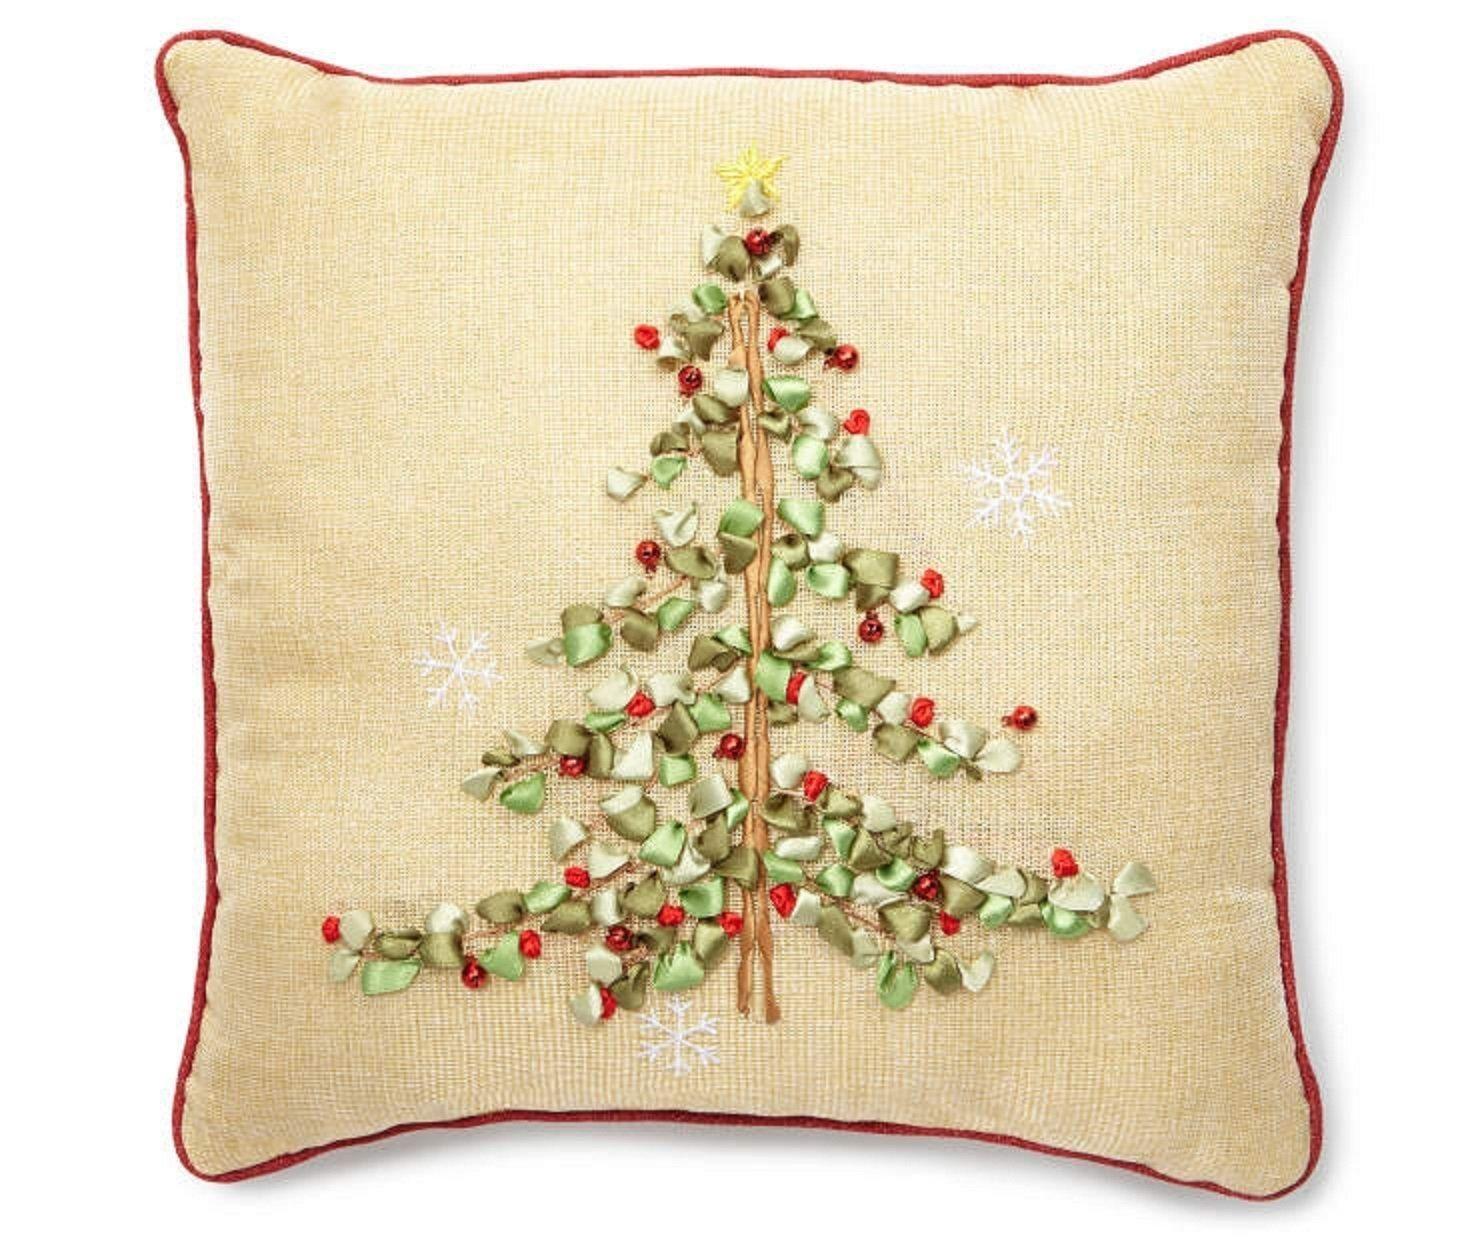 Ribbon Christmas Tree Decorative Throw Pillow Decorative Pillows Christmas Throw Pillows Pillows